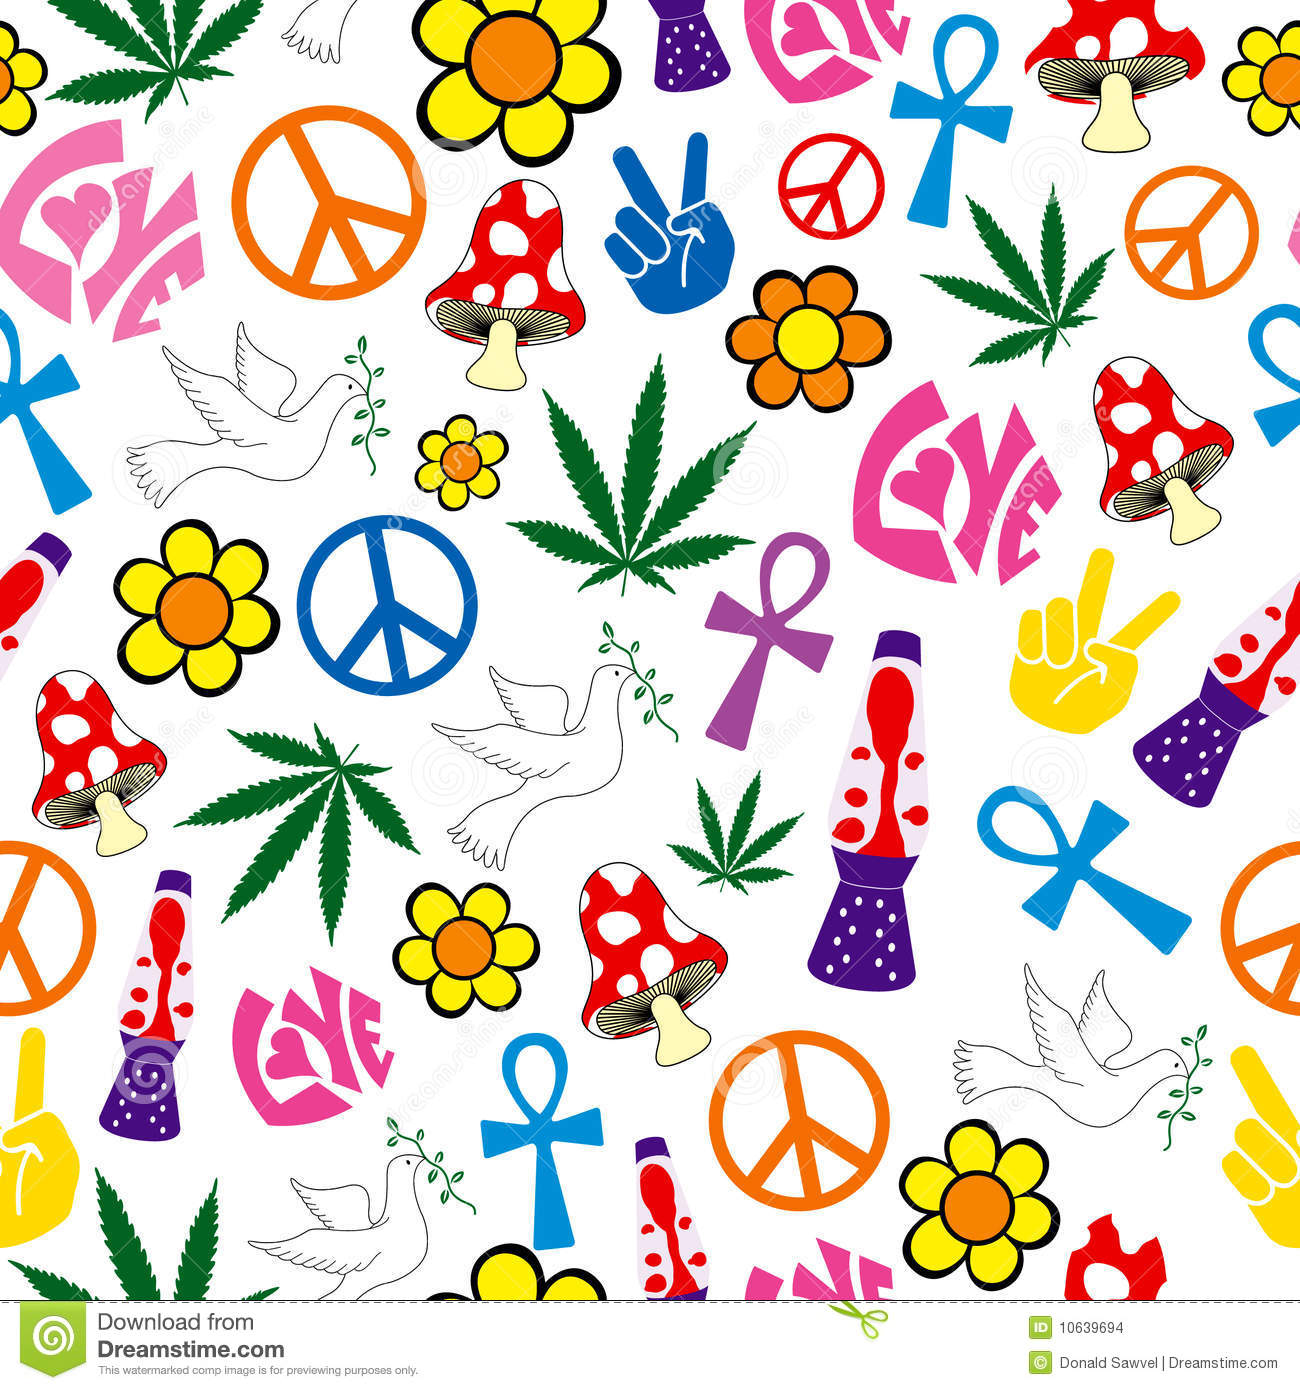 Wallpaper Of Peace: [49+] Peace And Love Wallpaper On WallpaperSafari